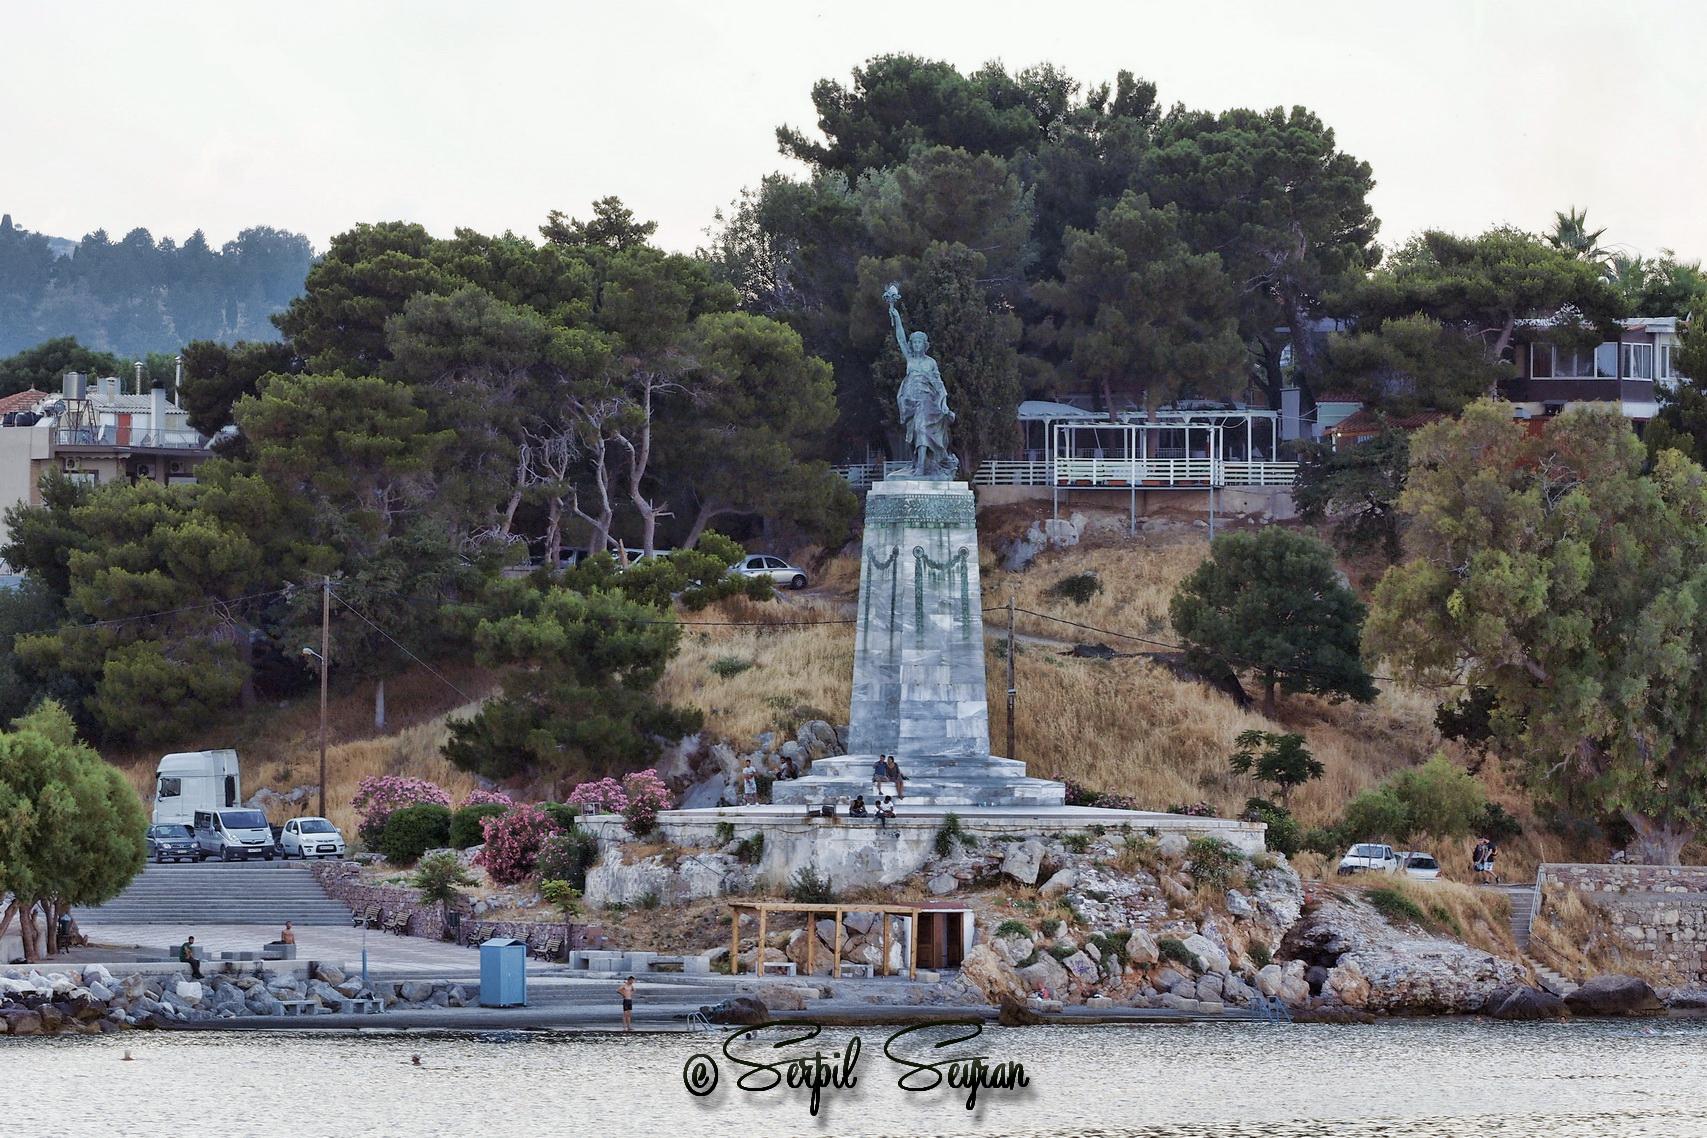 Midilli, Serpil Seyran